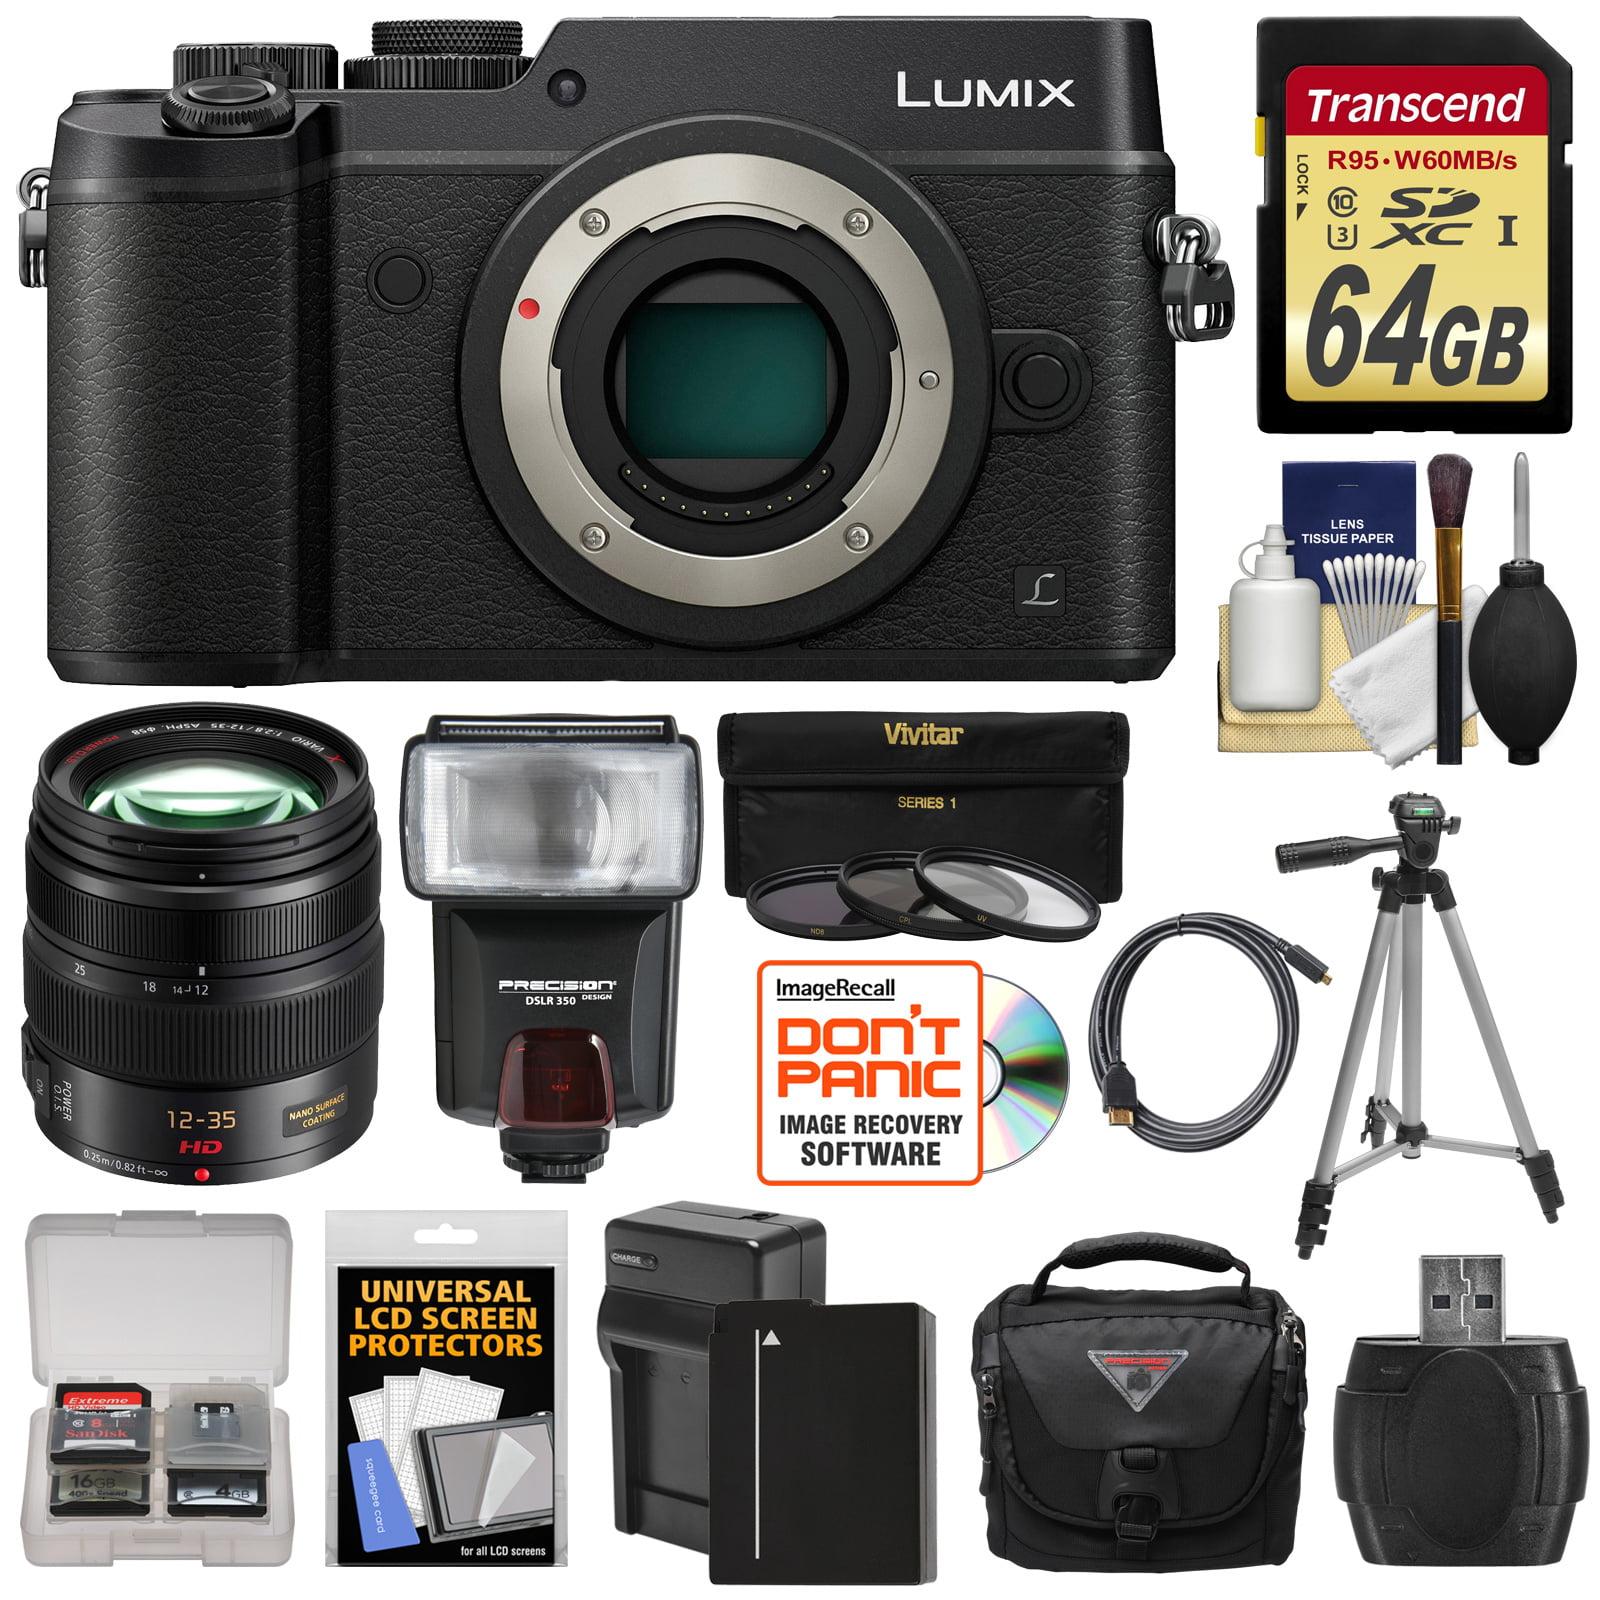 Panasonic Lumix DMC-GX8 4K Wi-Fi Digital Camera Body (Black) with 12-35mm f 2.8 OIS Lens + 64GB Card + Battery... by Panasonic